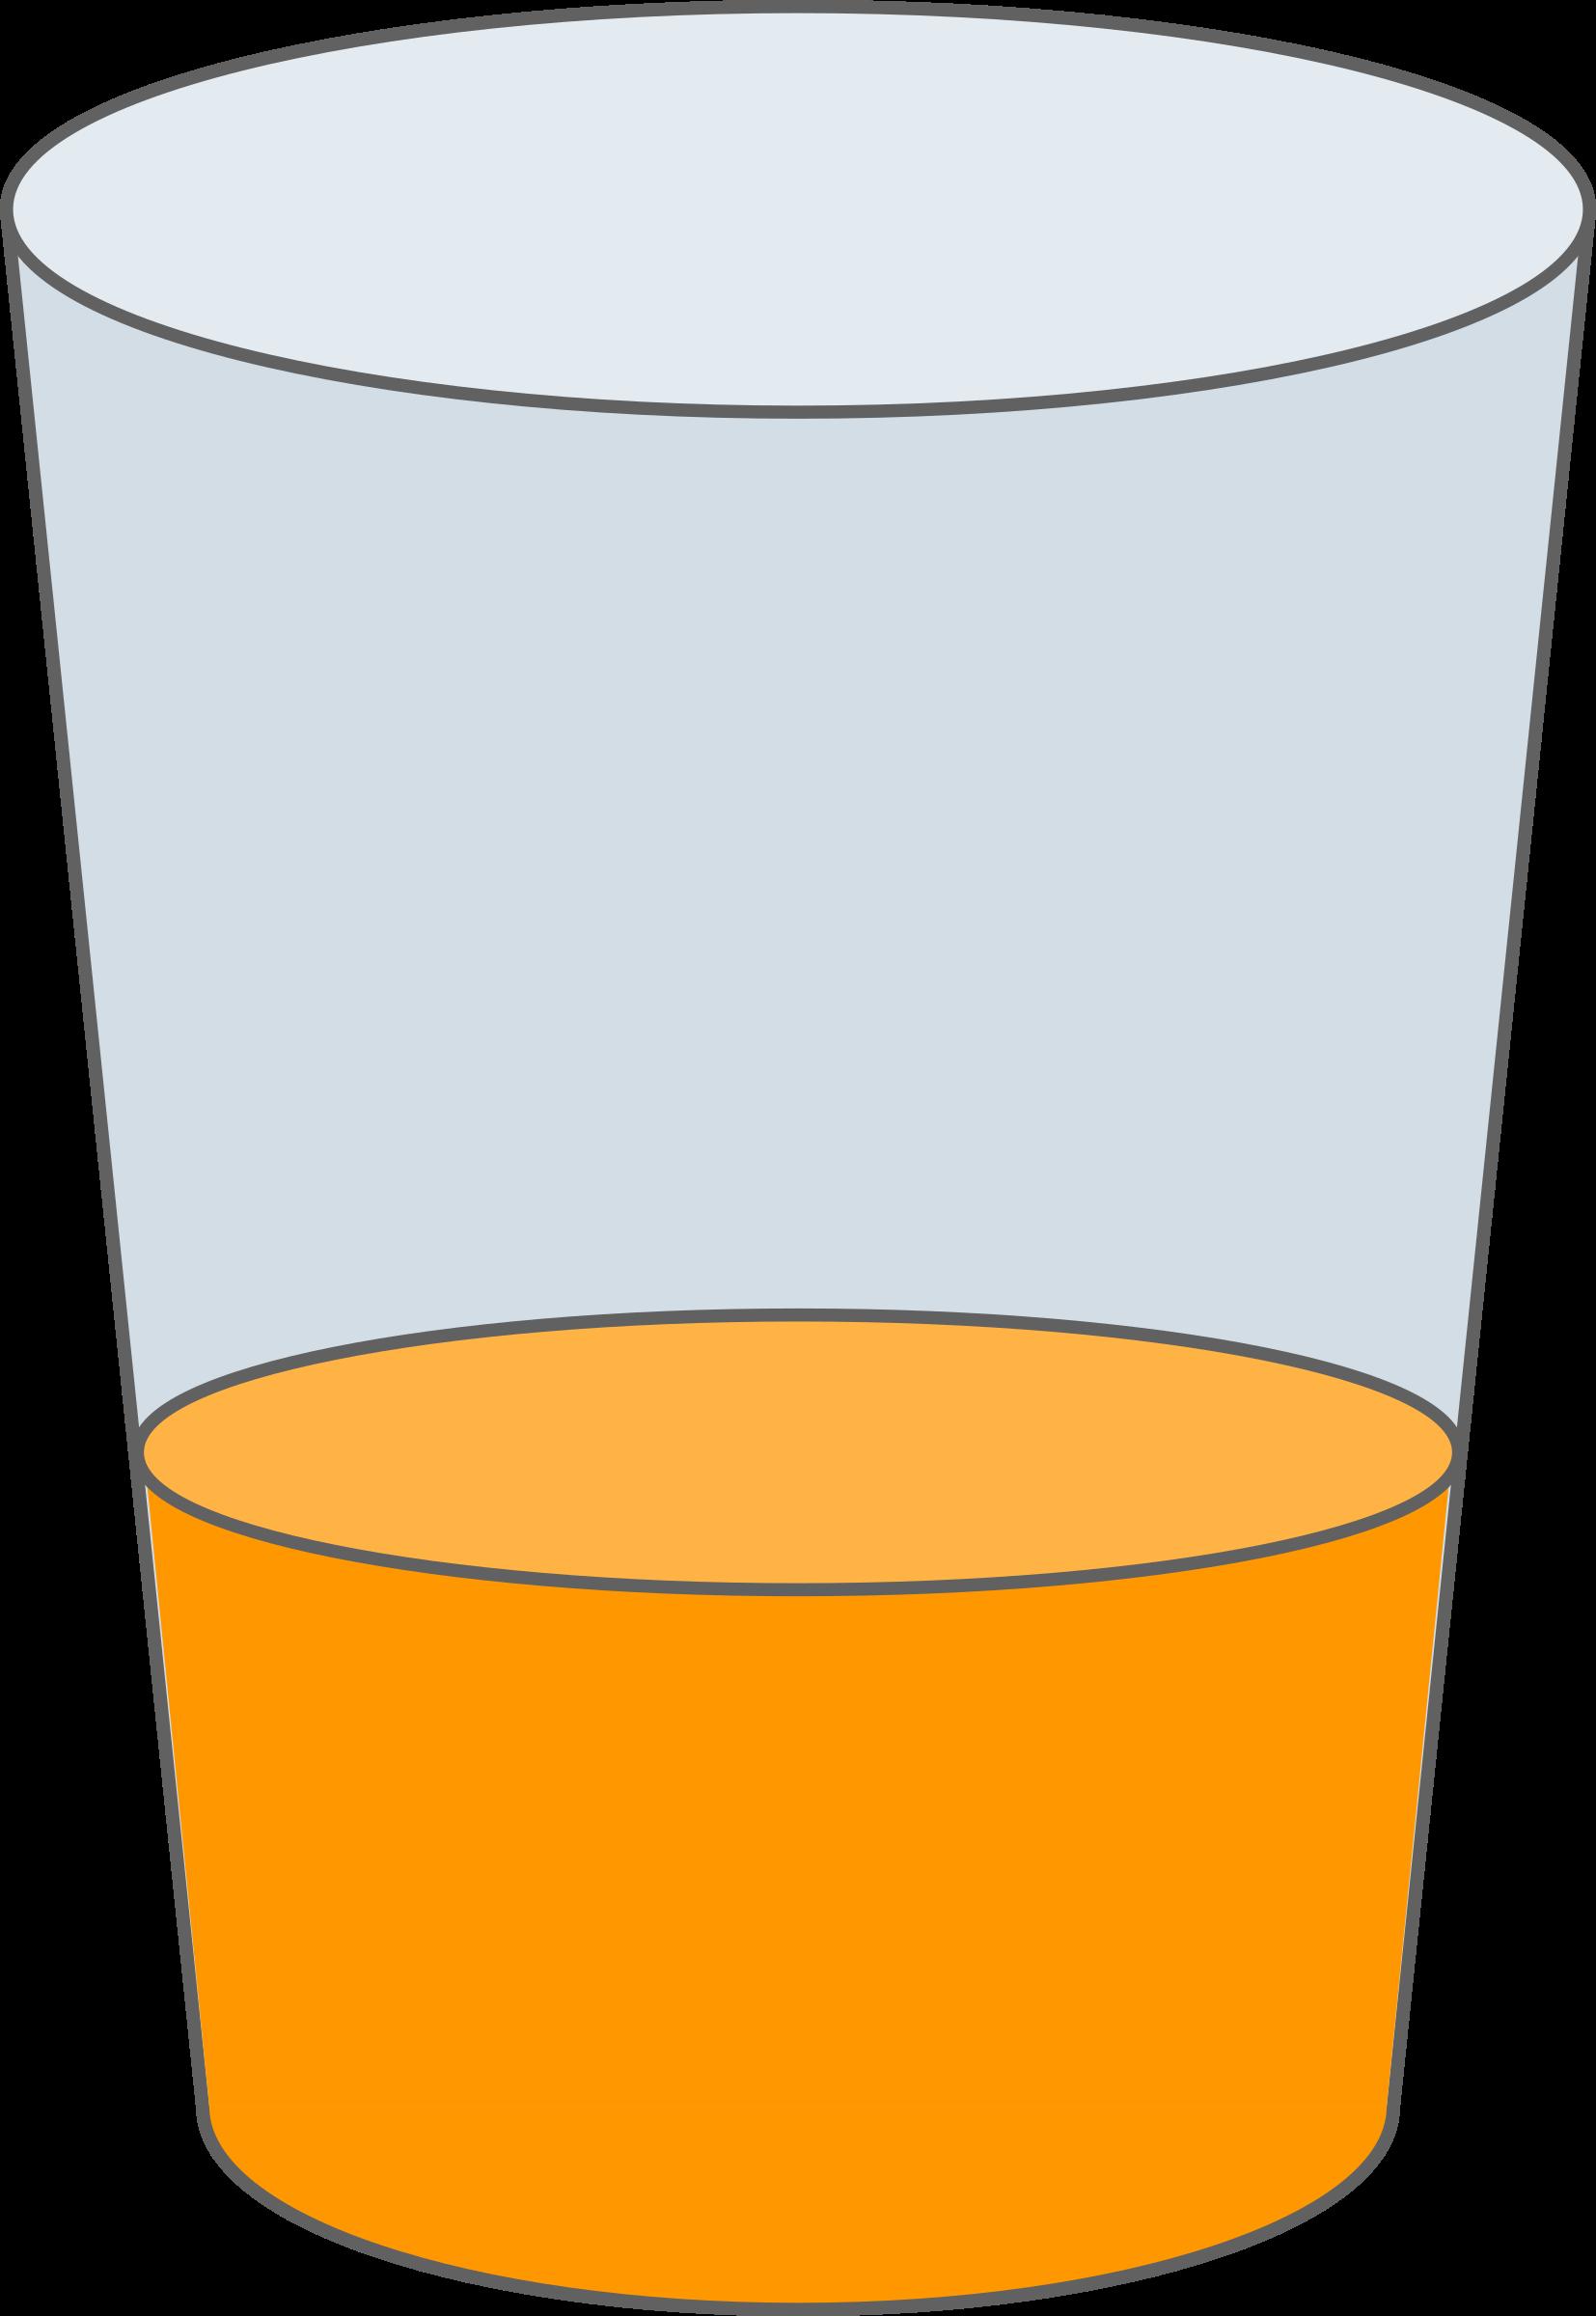 Tumbler frames illustrations hd. Glass clipart buttermilk